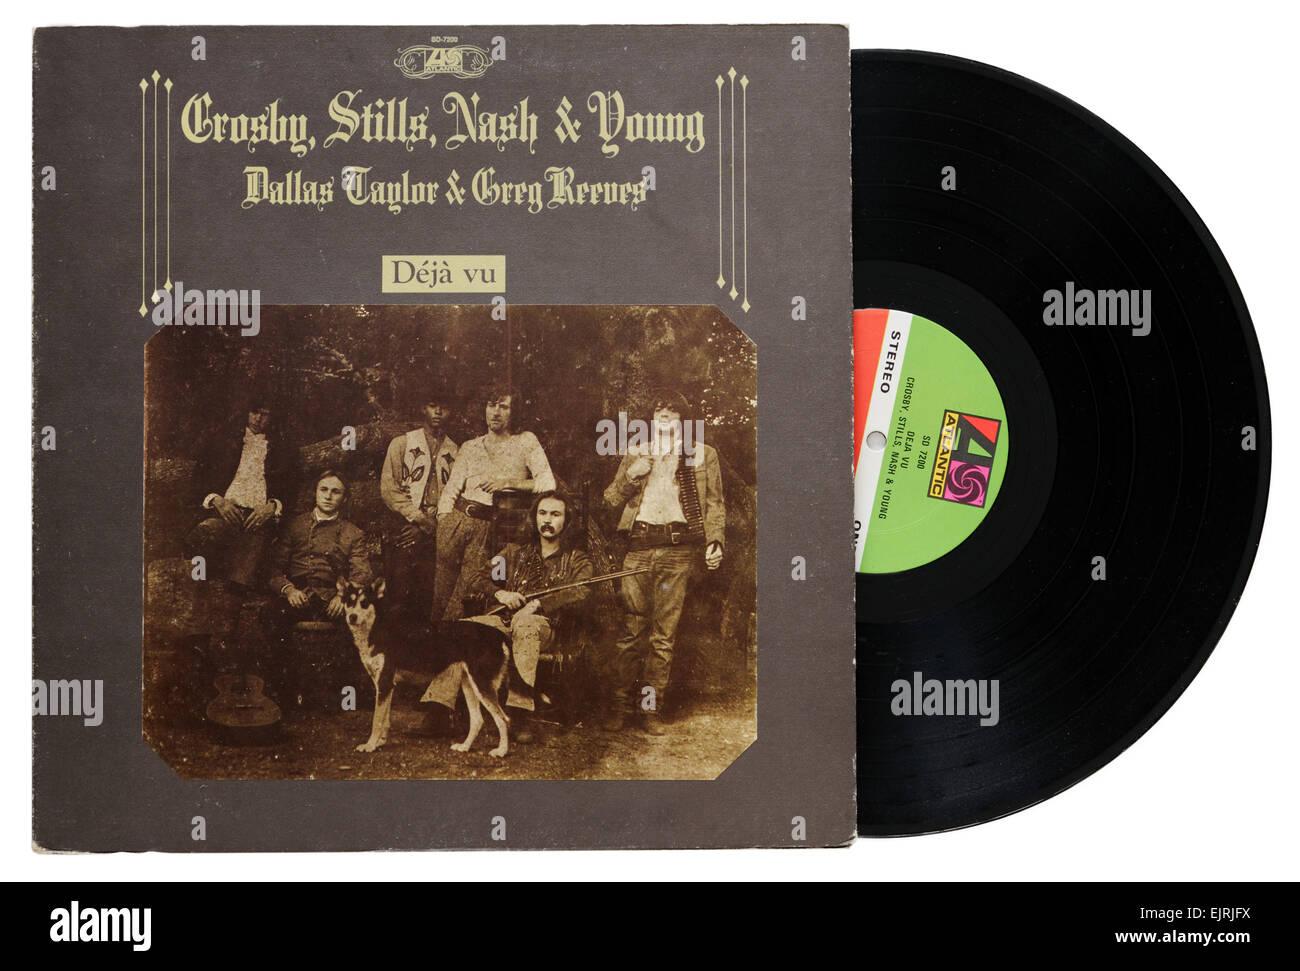 Crosby Stills Nash and Young album Deja Vu - Stock Image